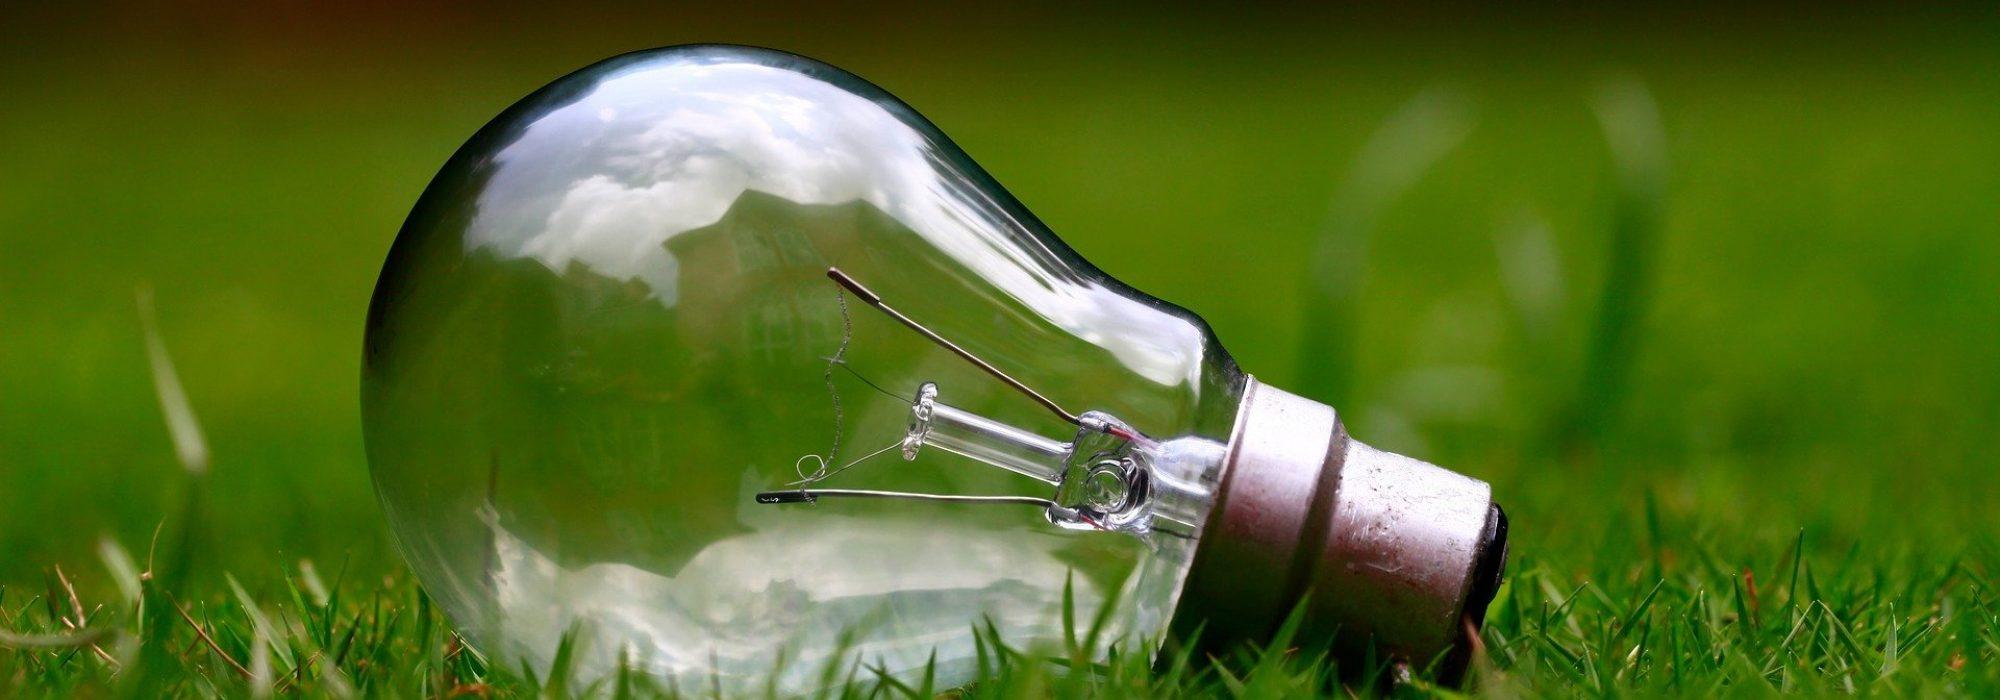 light-bulb-gc89bf4138_1920